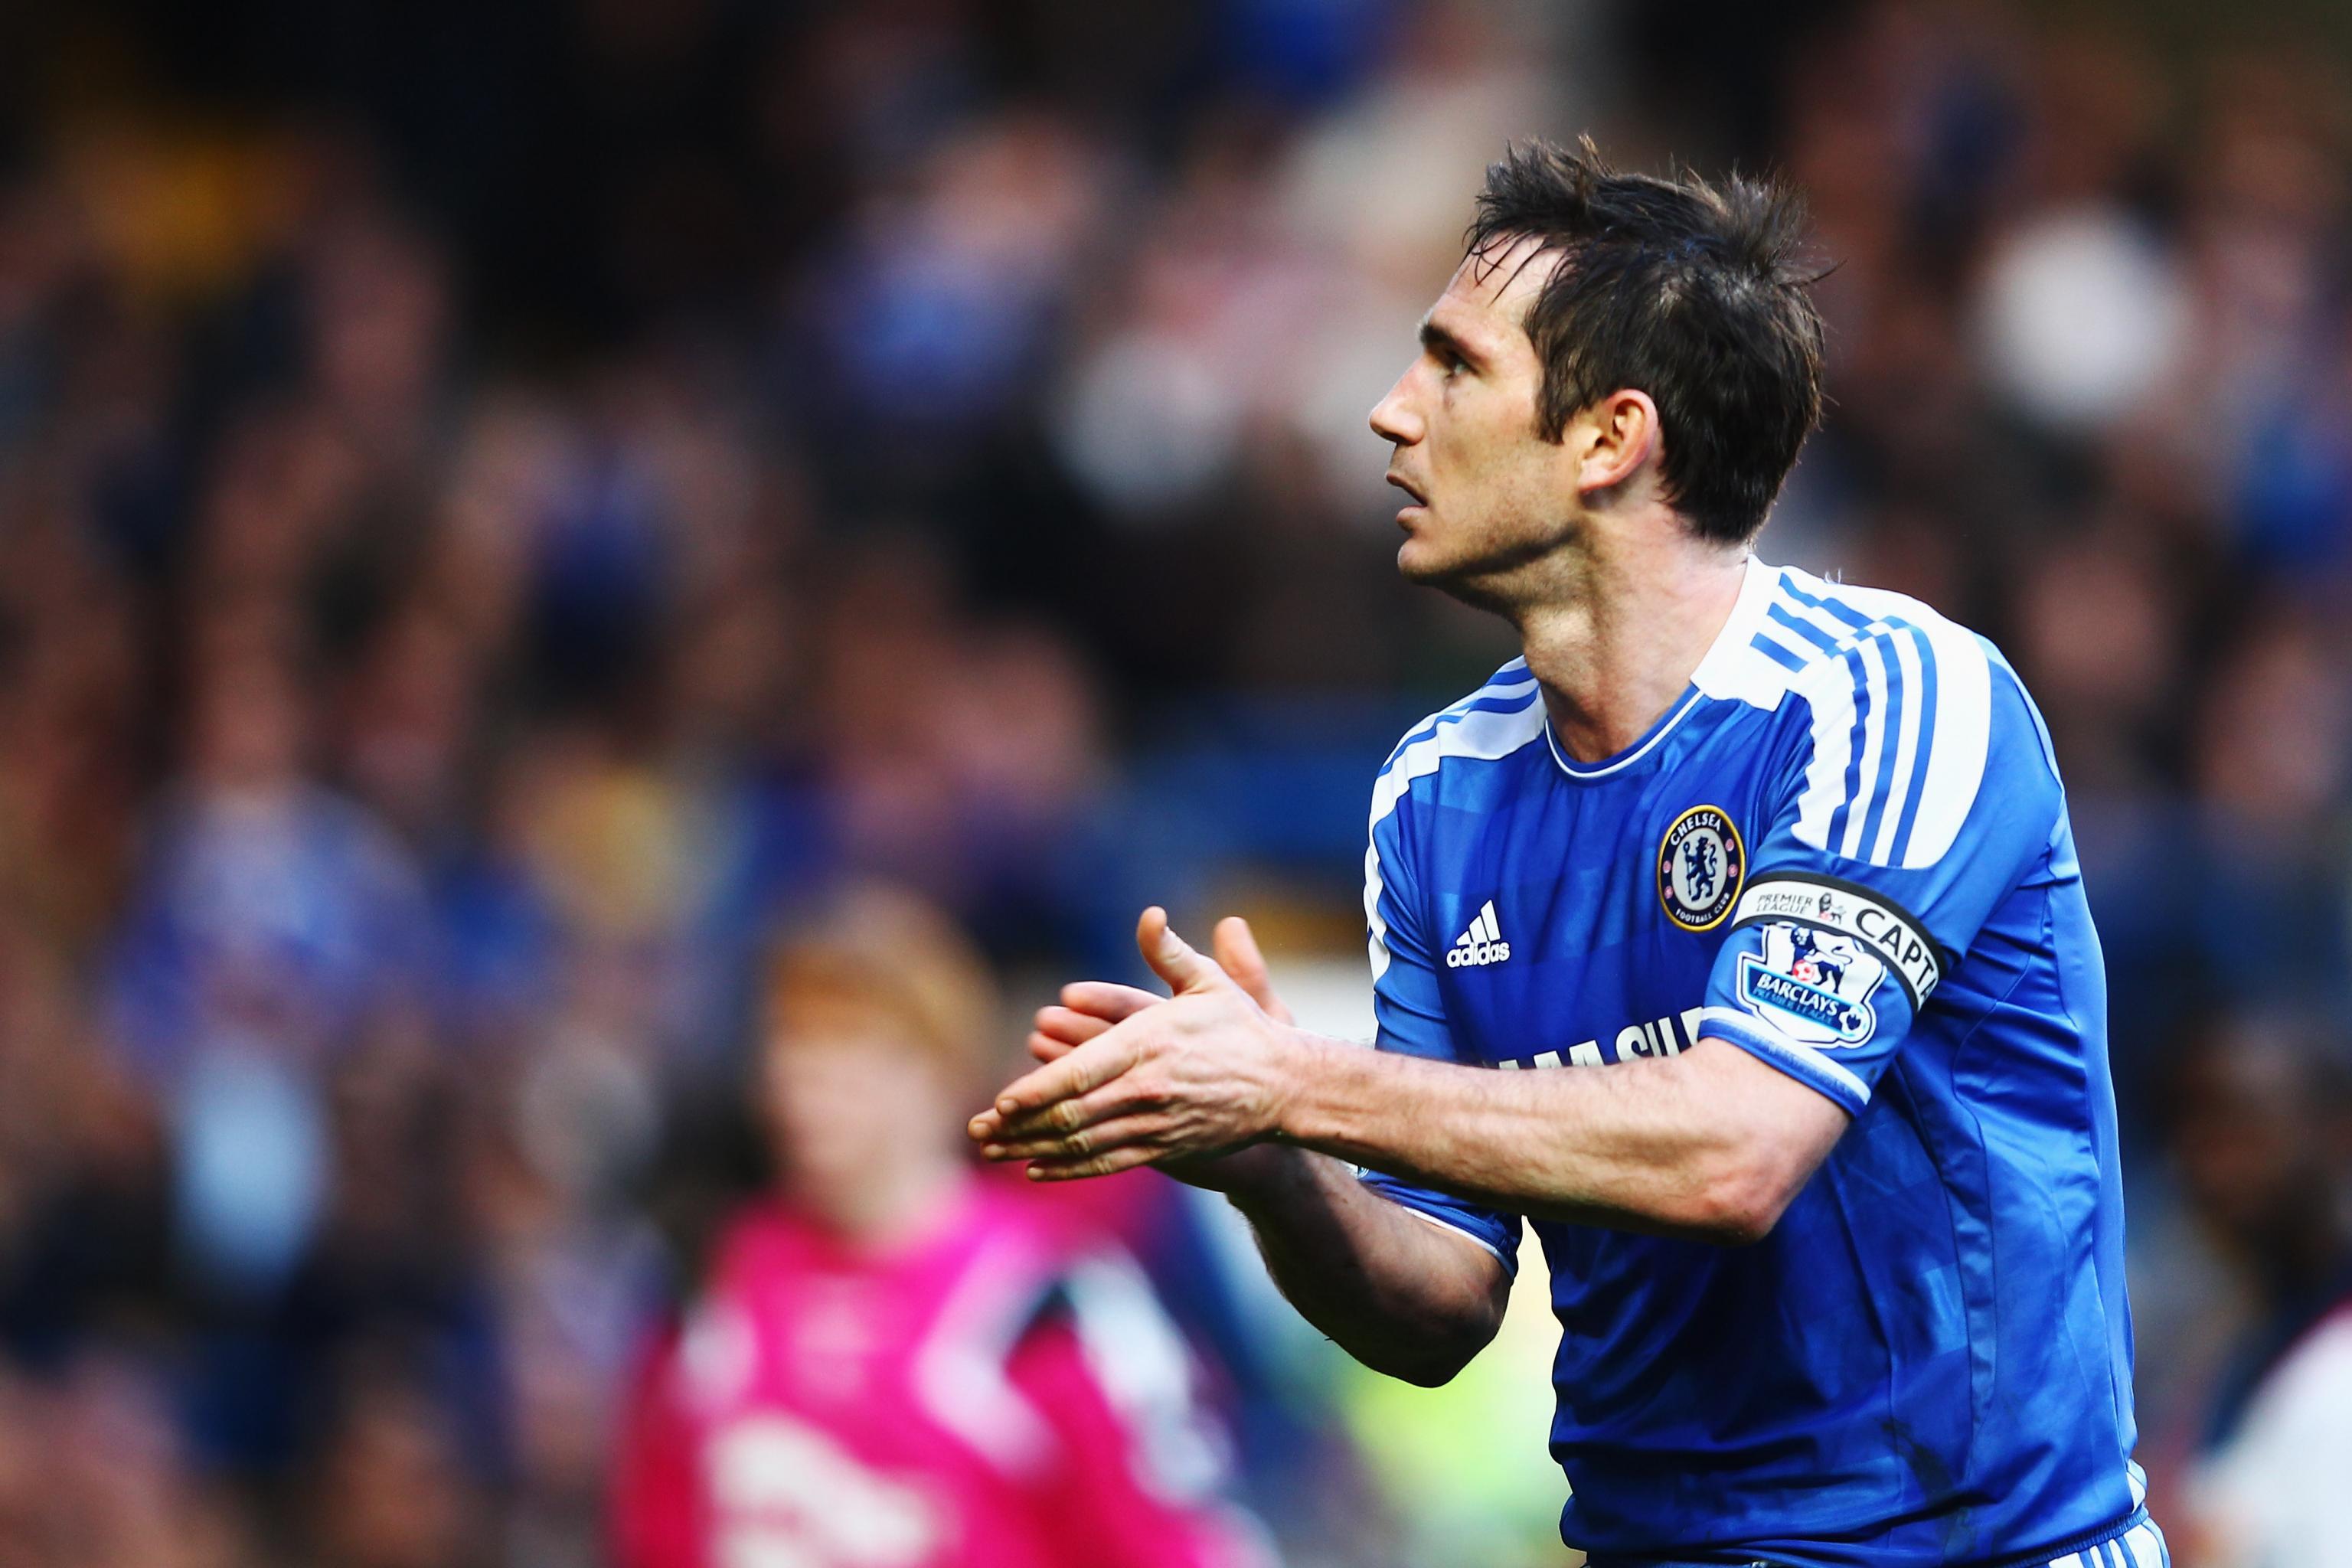 Frank Lampard: 5 Reasons Chelsea Still Needs the Veteran Midfielder | Bleacher Report | Latest News, Videos and Highlights